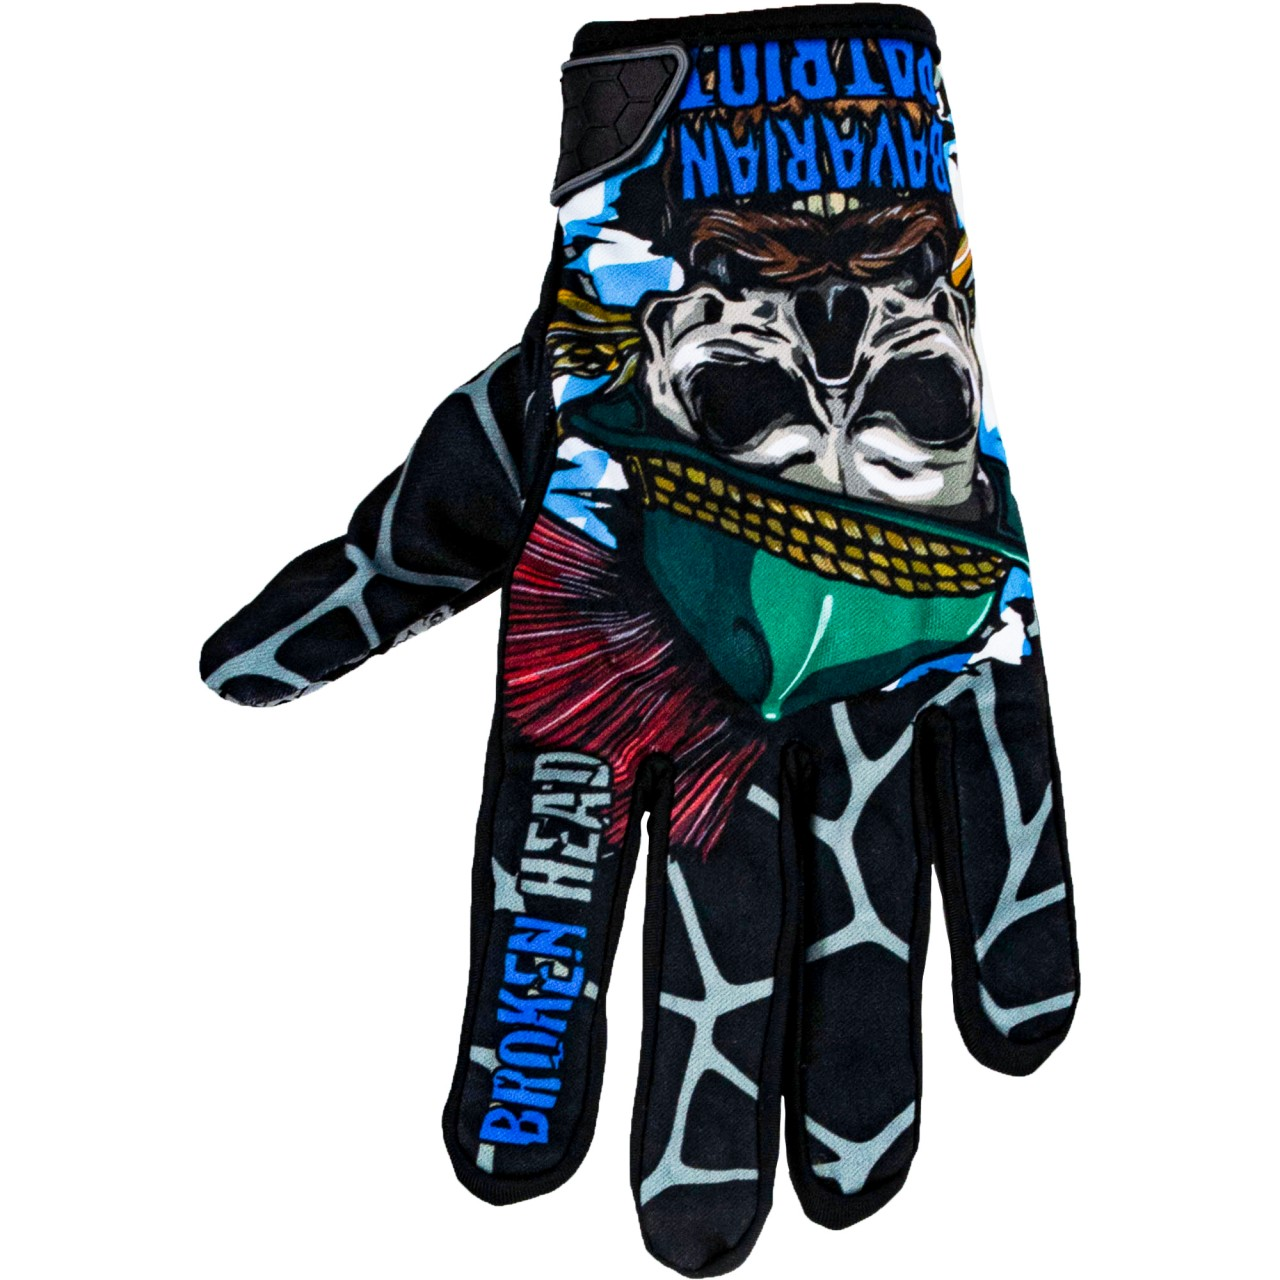 Bekleidung|Handschuhe Broken Head MX Handschuhe Bavarian Patriot Schwarz